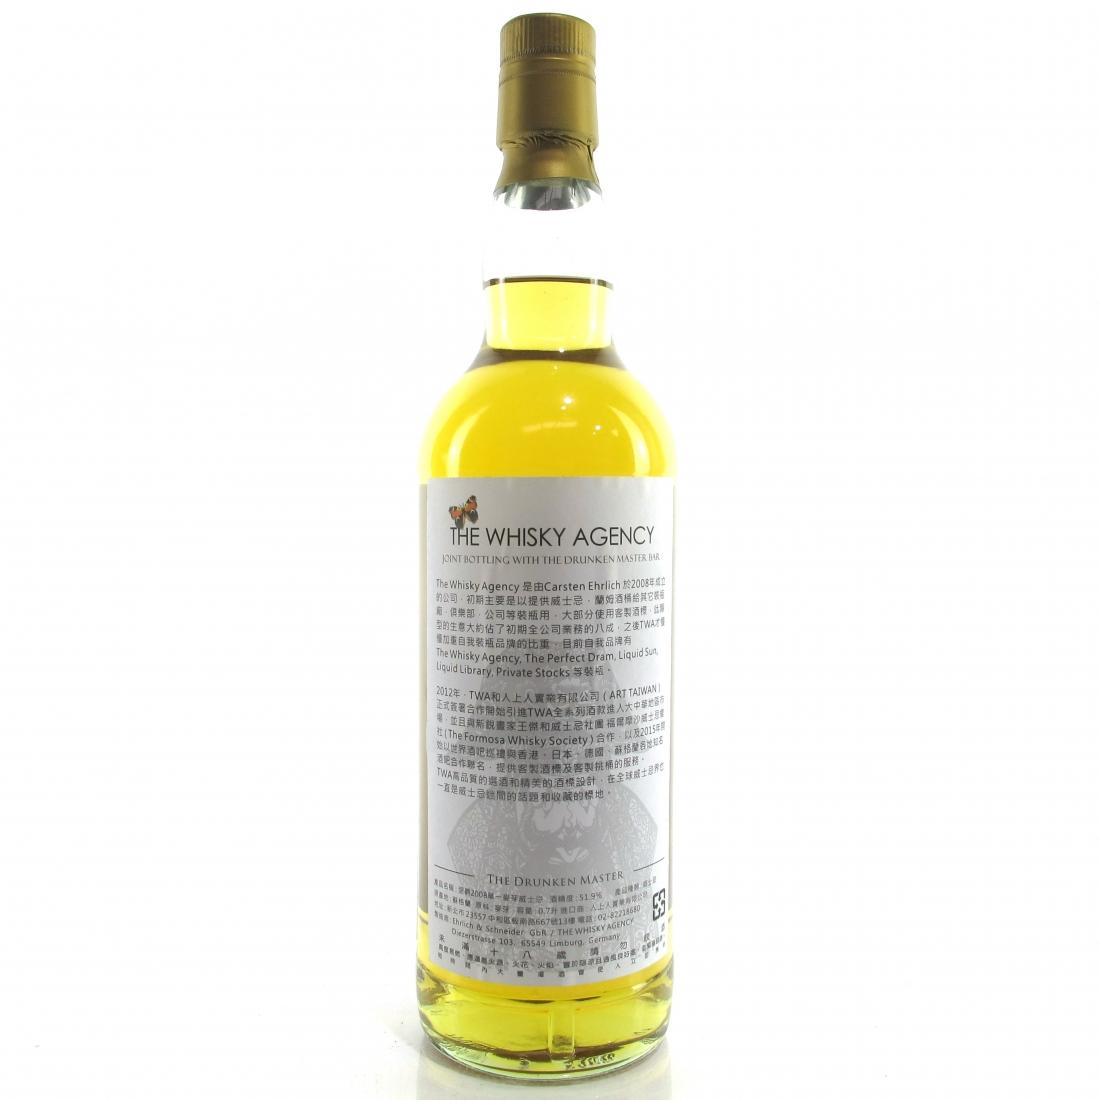 Ledaig 2008 Whisky Agency 8 Year Old / The Drunken Master